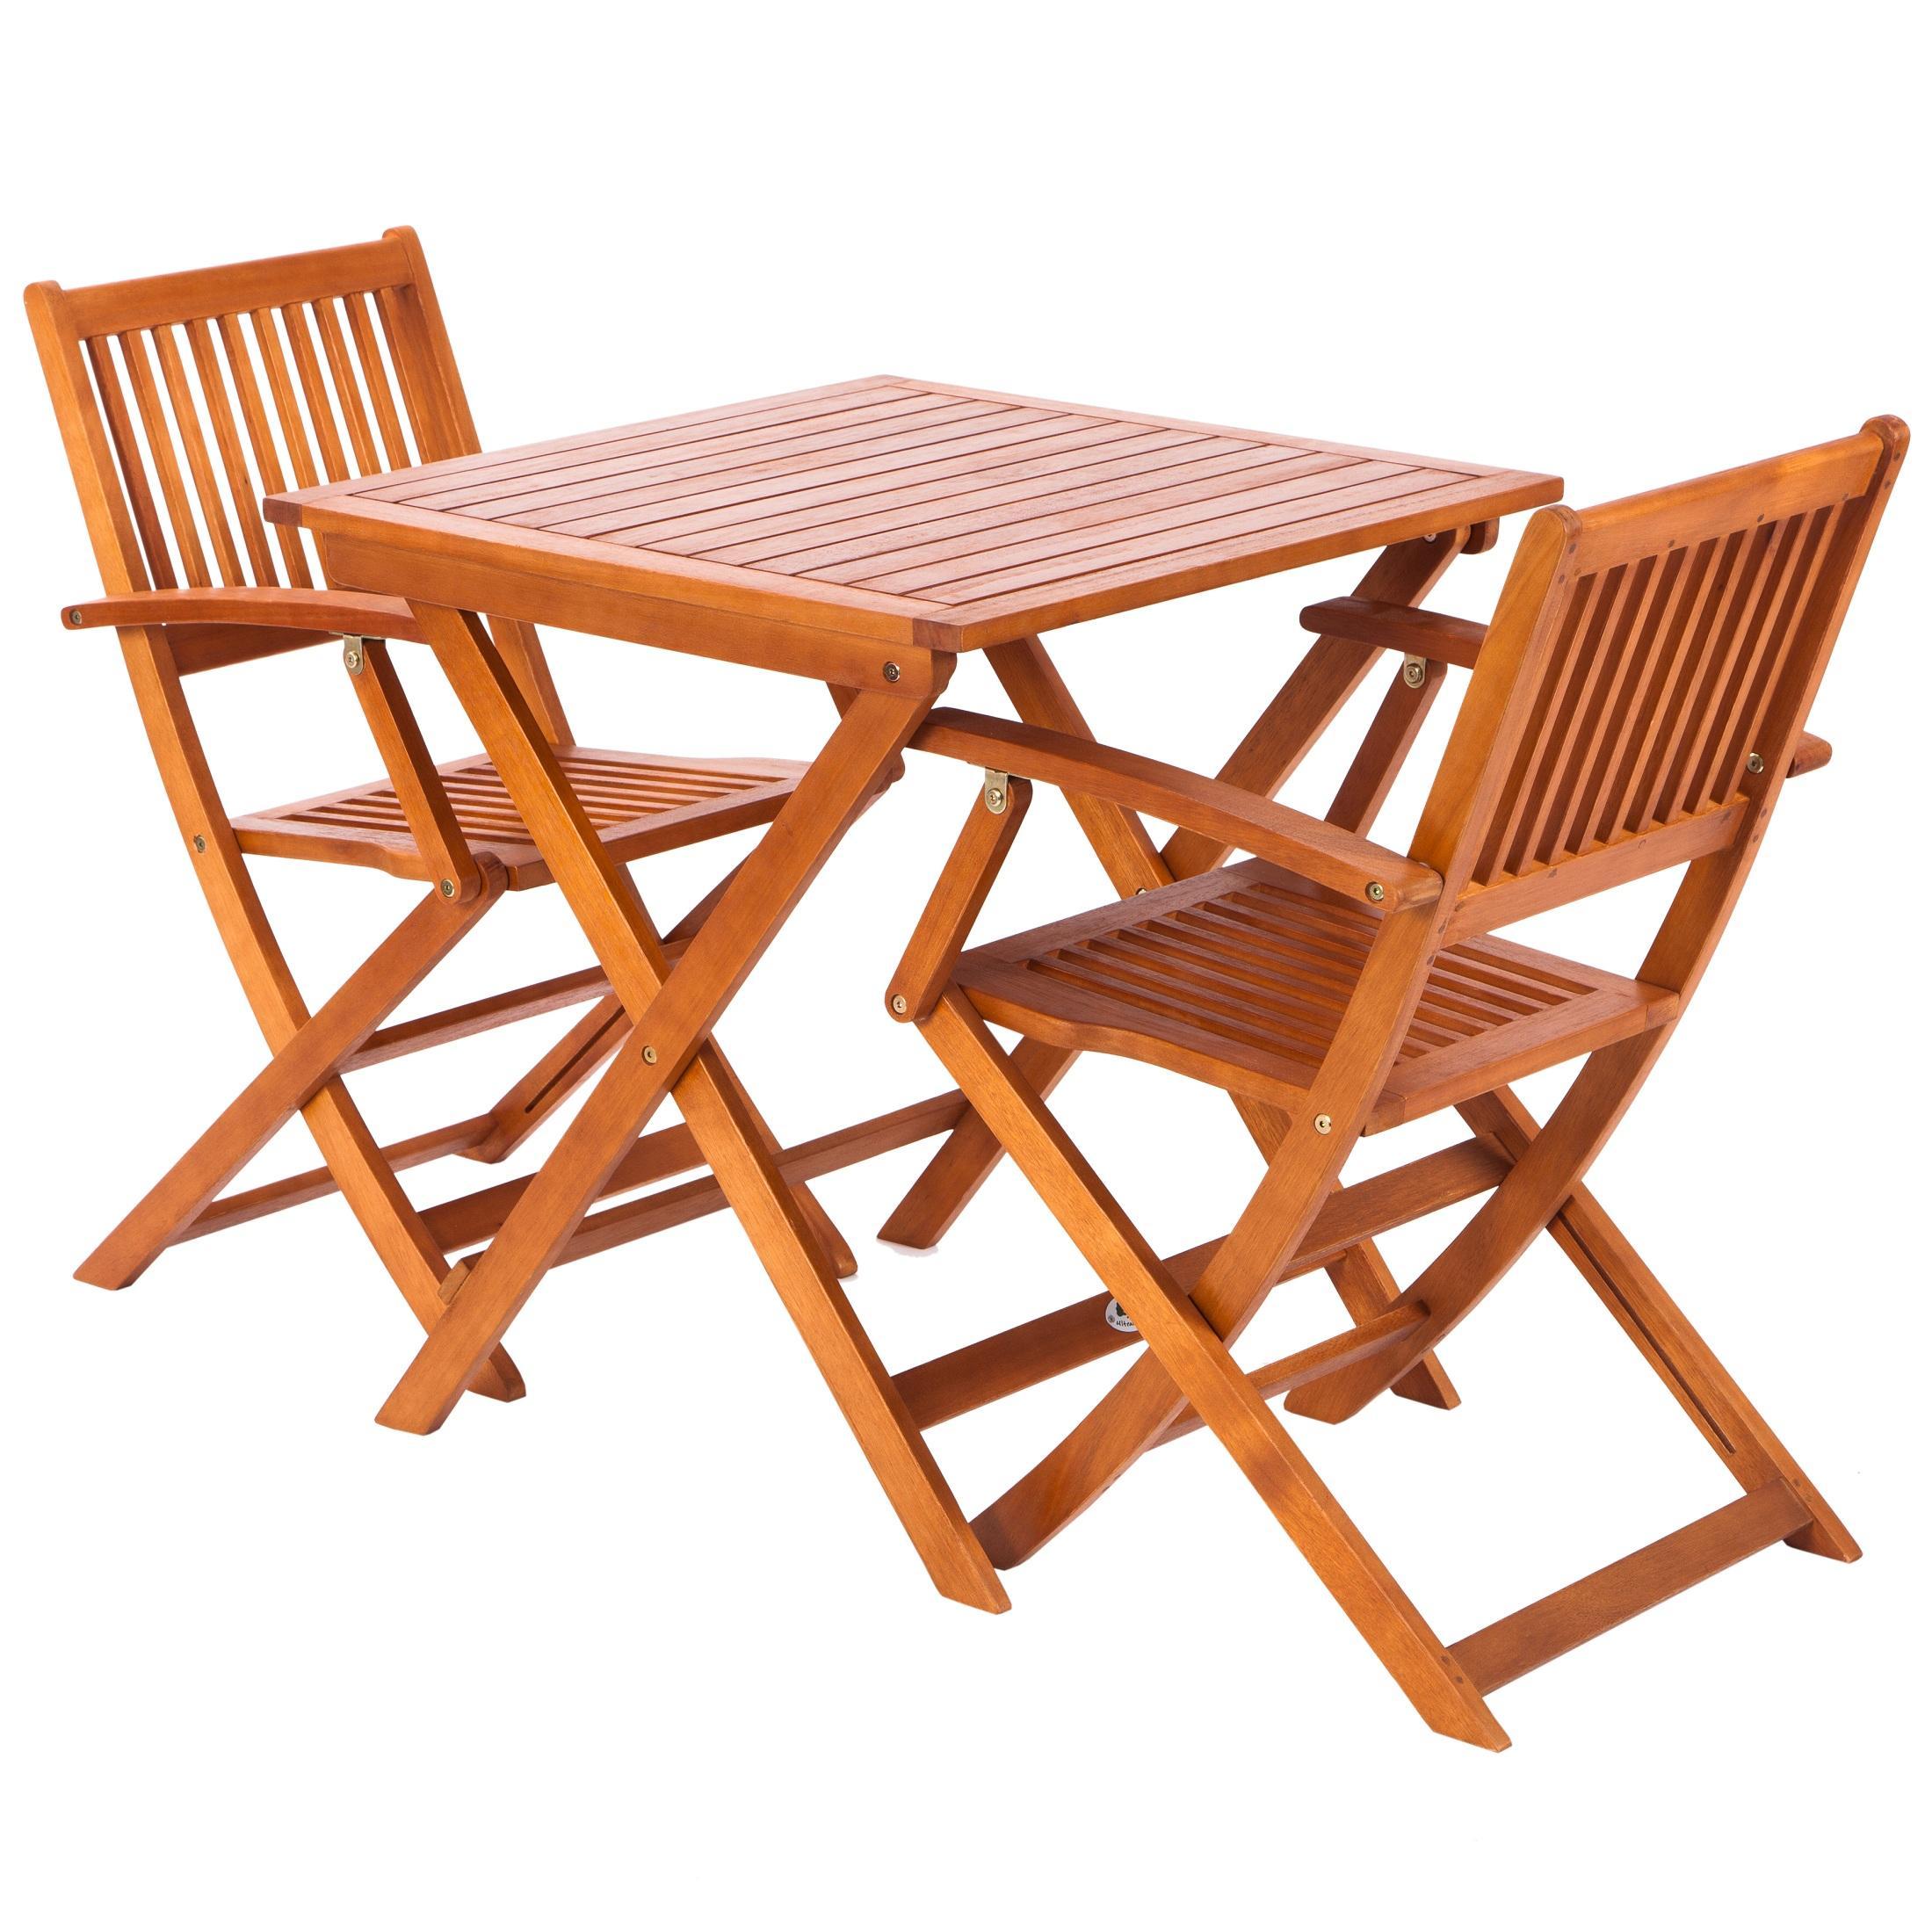 Ultranatura canberra conjunto de balc n o terraza for Conjunto muebles balcon